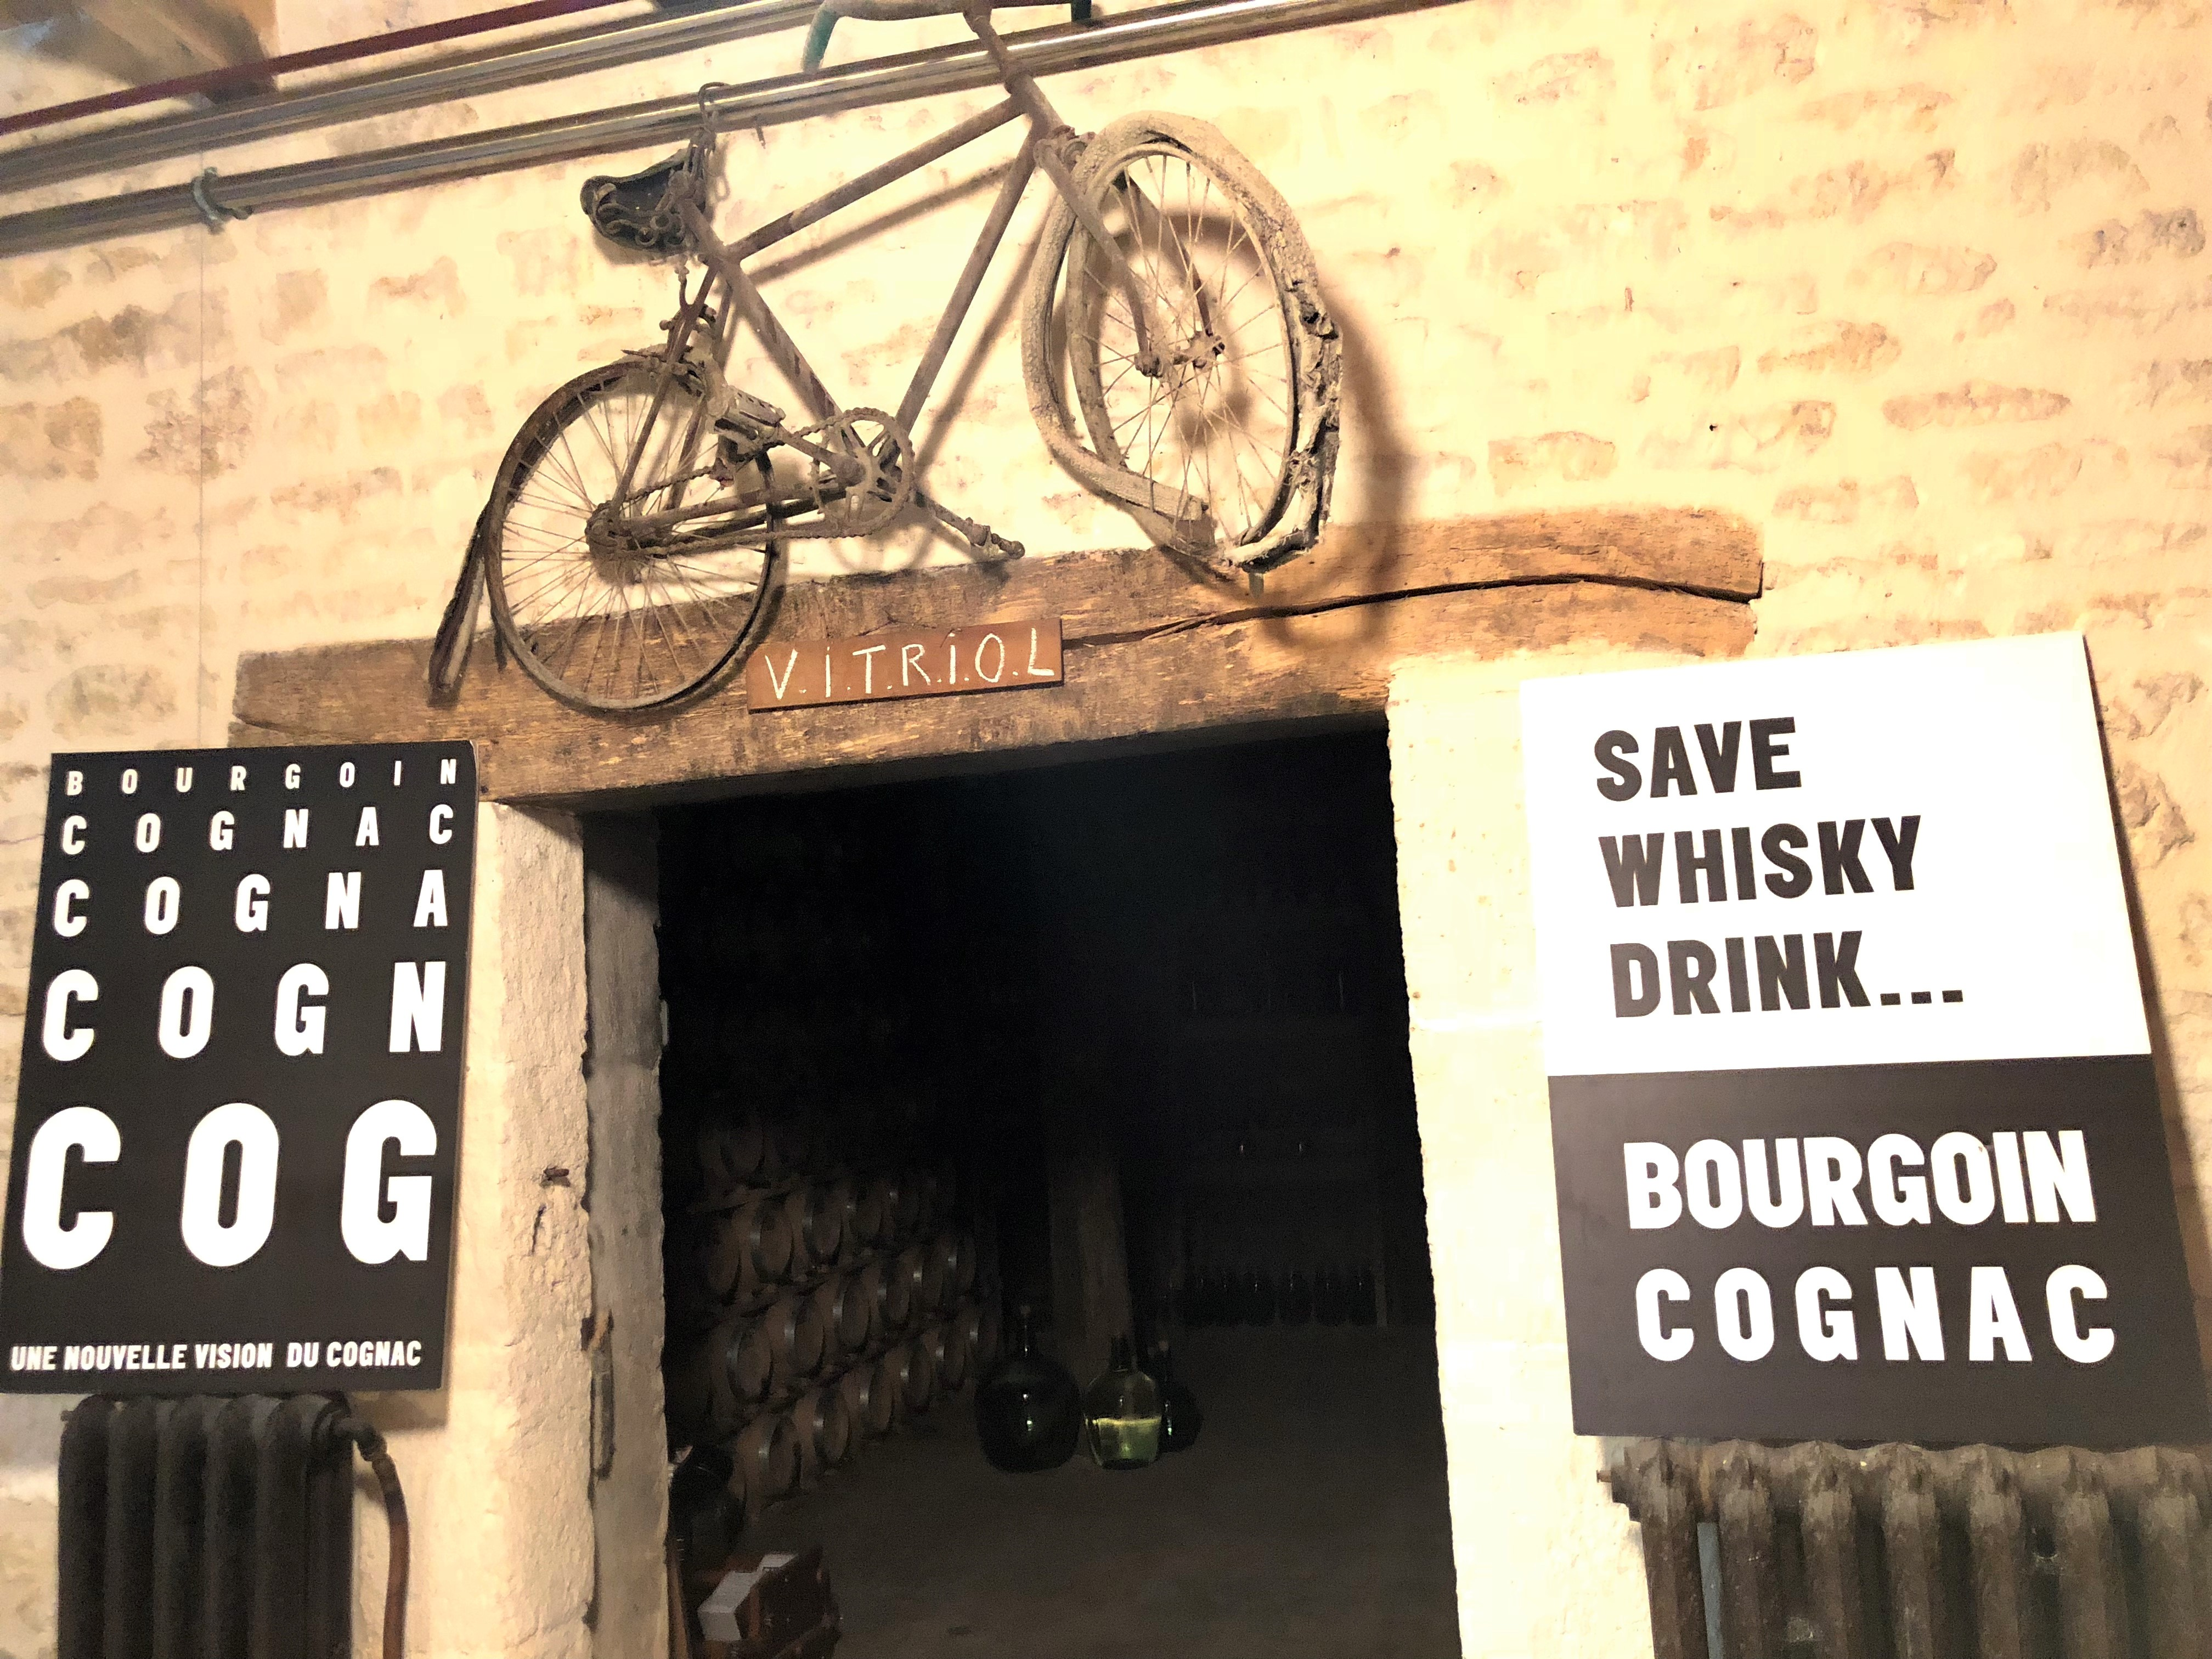 livingincognac bourgoin cognac